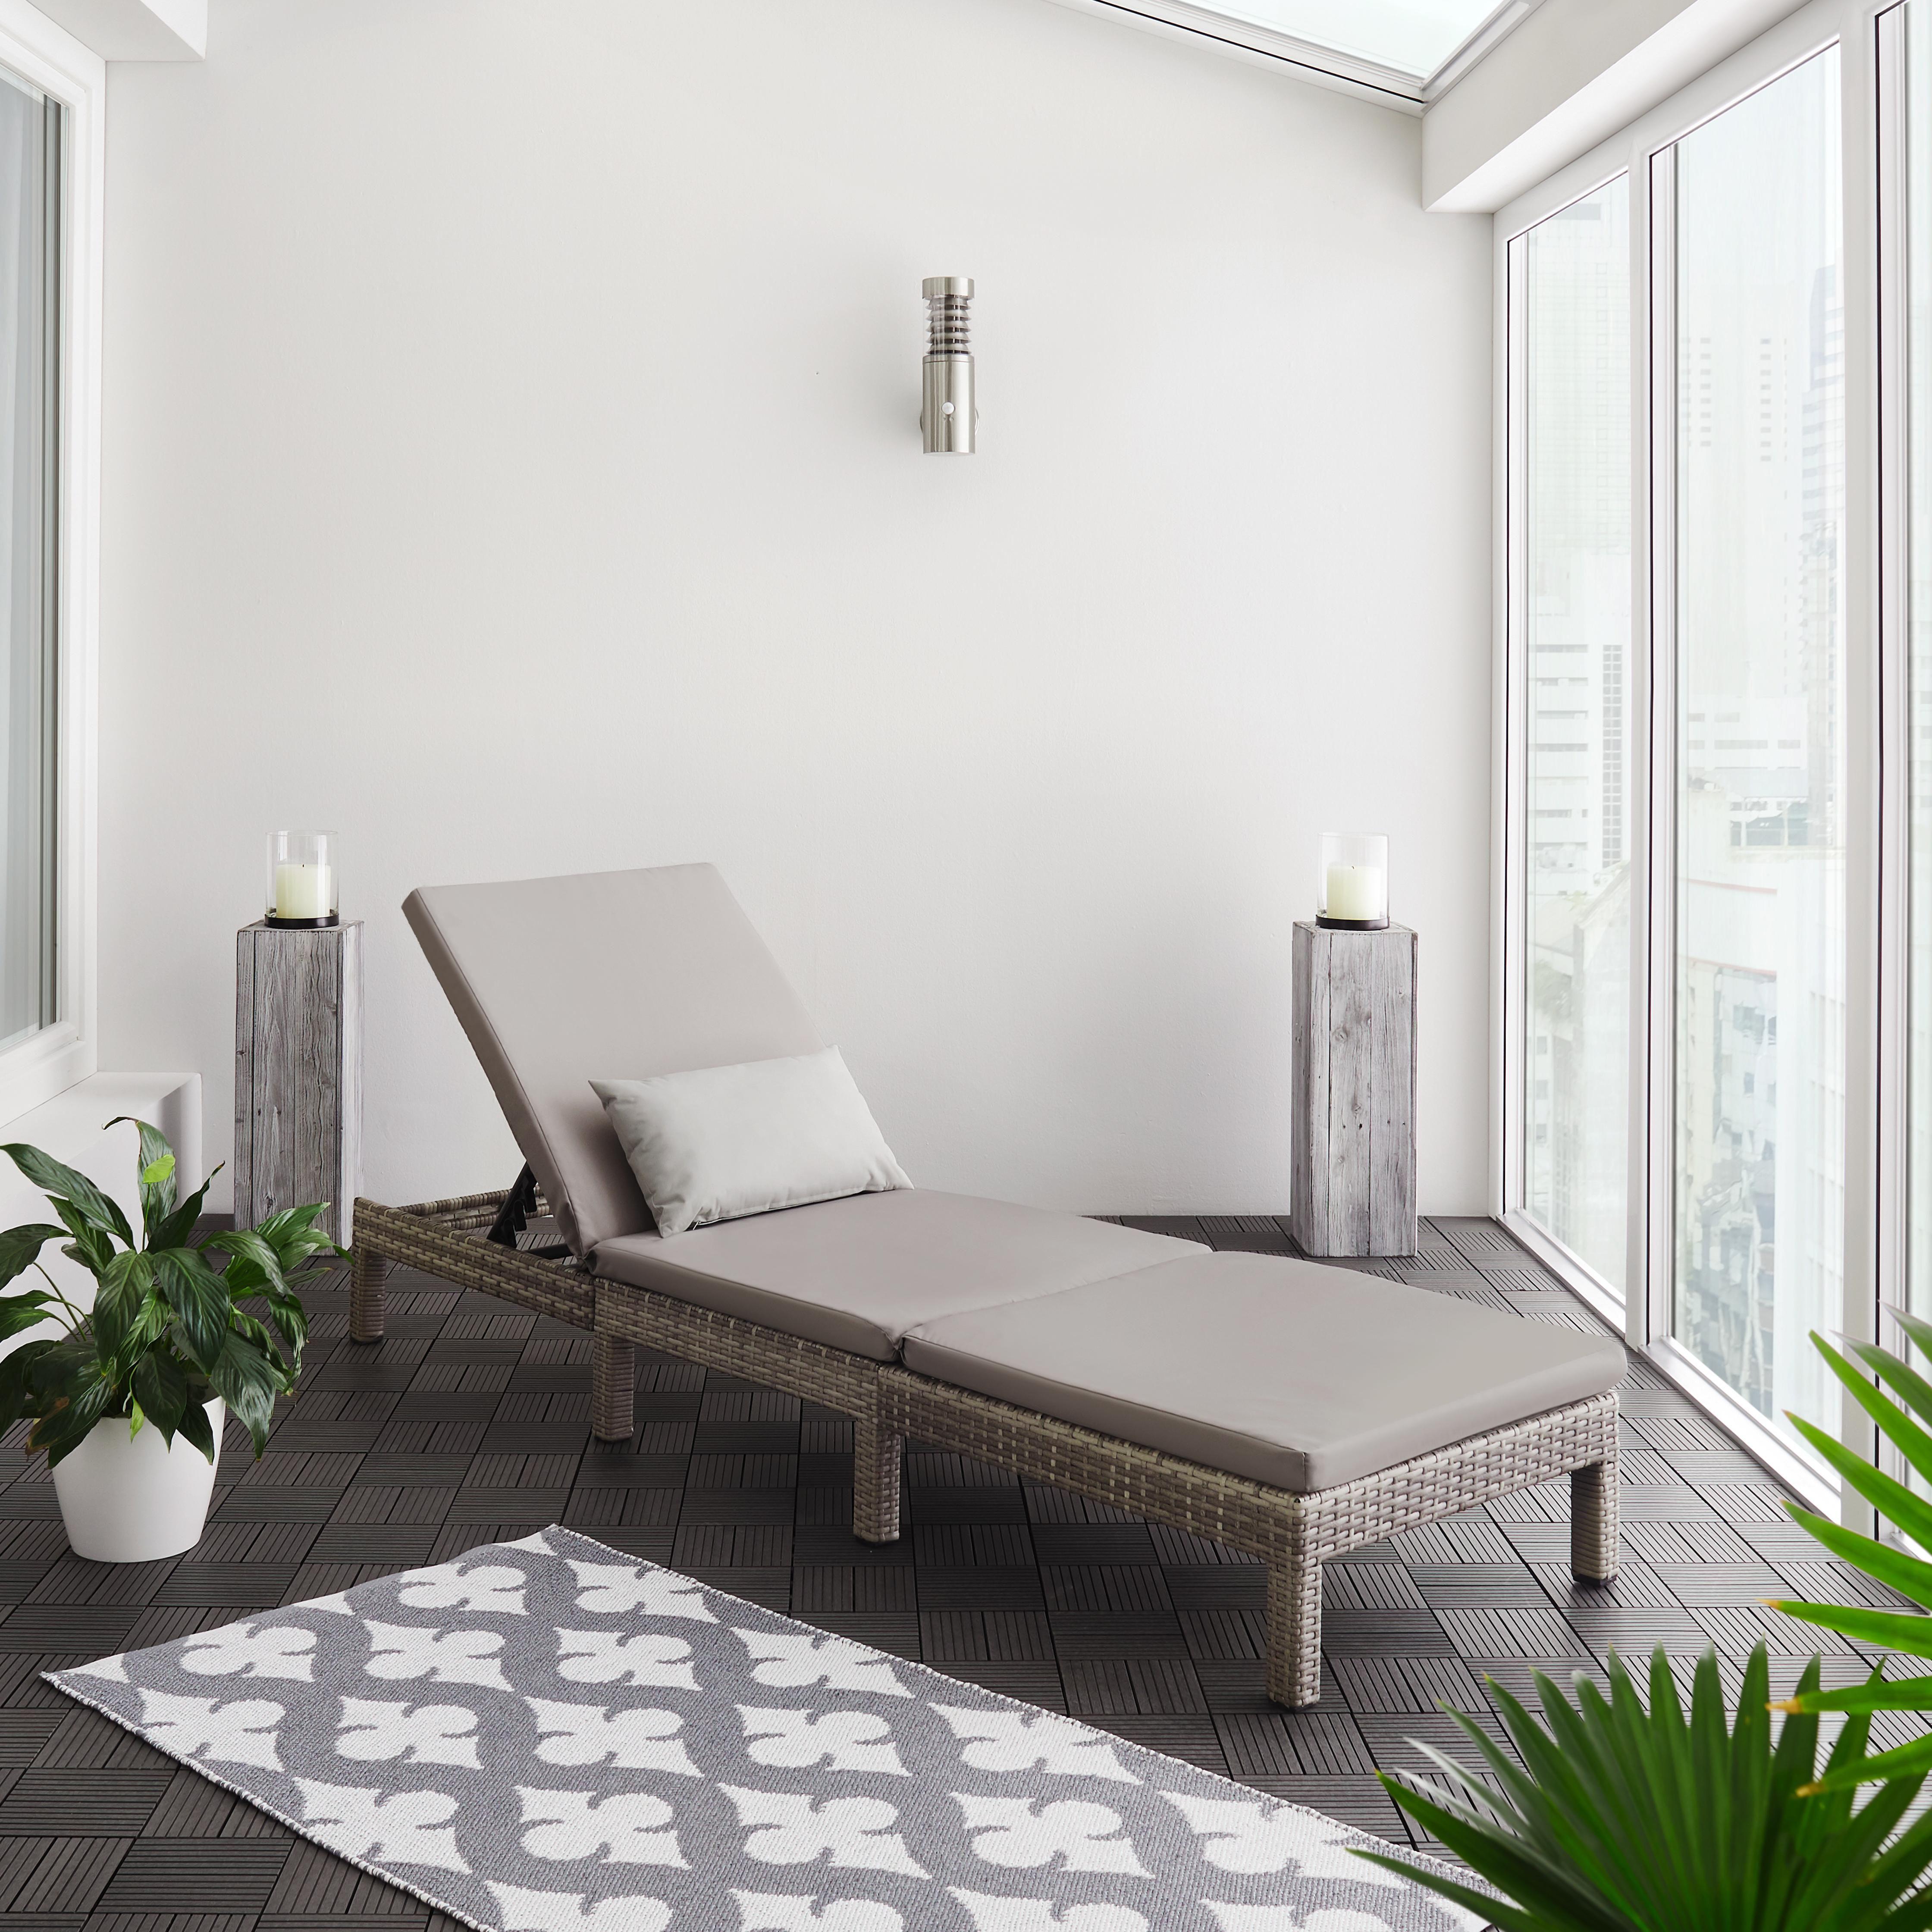 Gartenliege Sarah inkl. Auflage - Hellgrau/Grau, MODERN, Kunststoff/Textil (60/28/198cm) - Modern Living